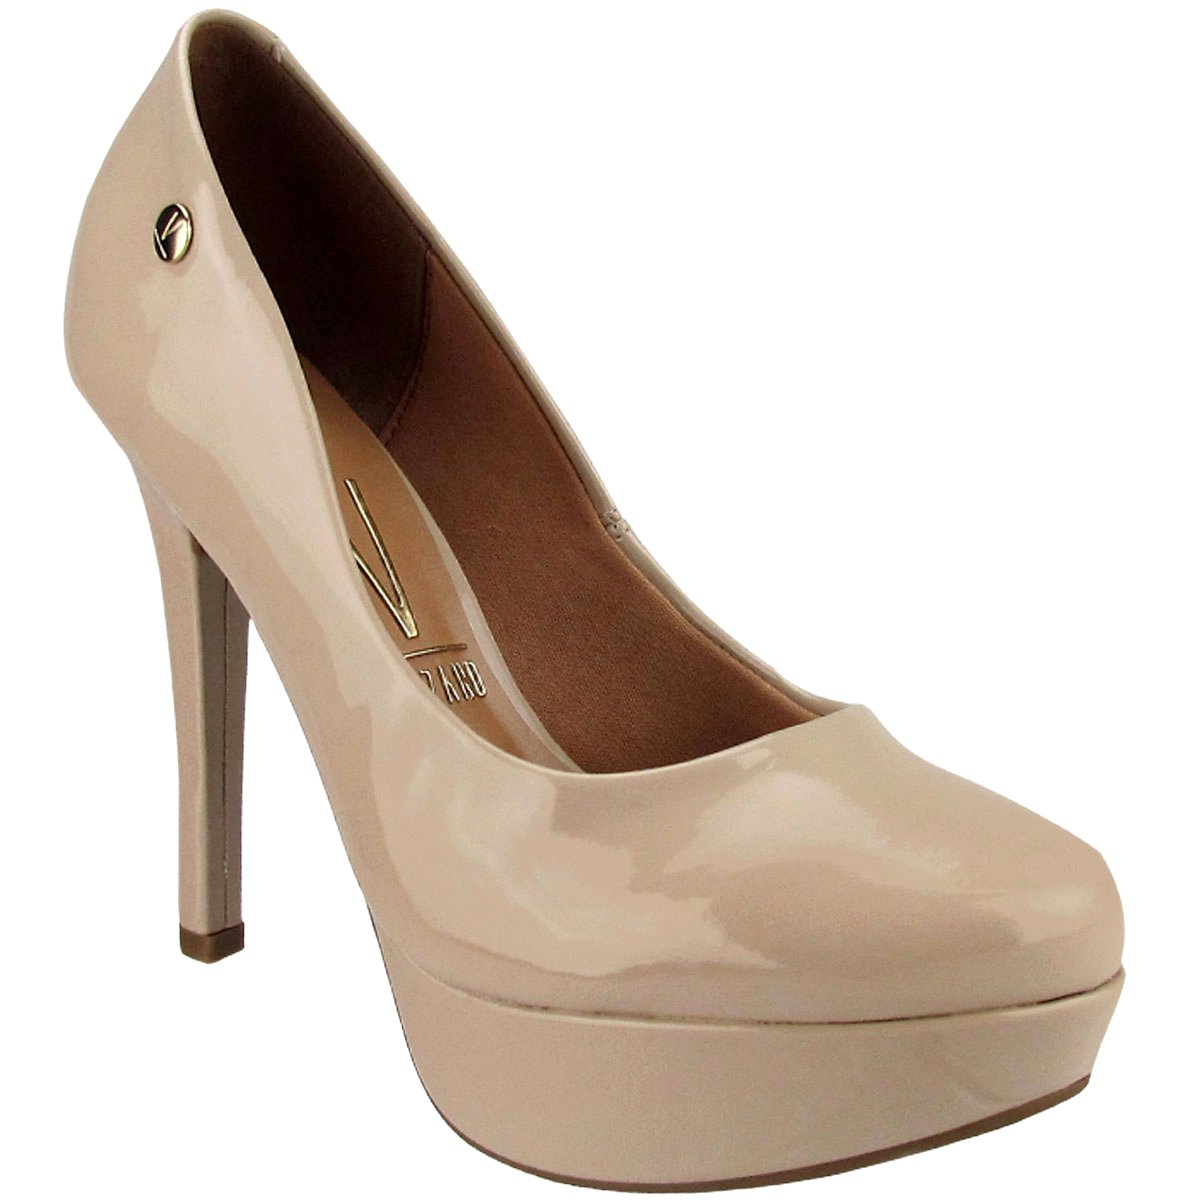 be2df6ef20 Sapato Vizzano Verniz Cristal Brilho Bege Feminino - Compre Agora ...